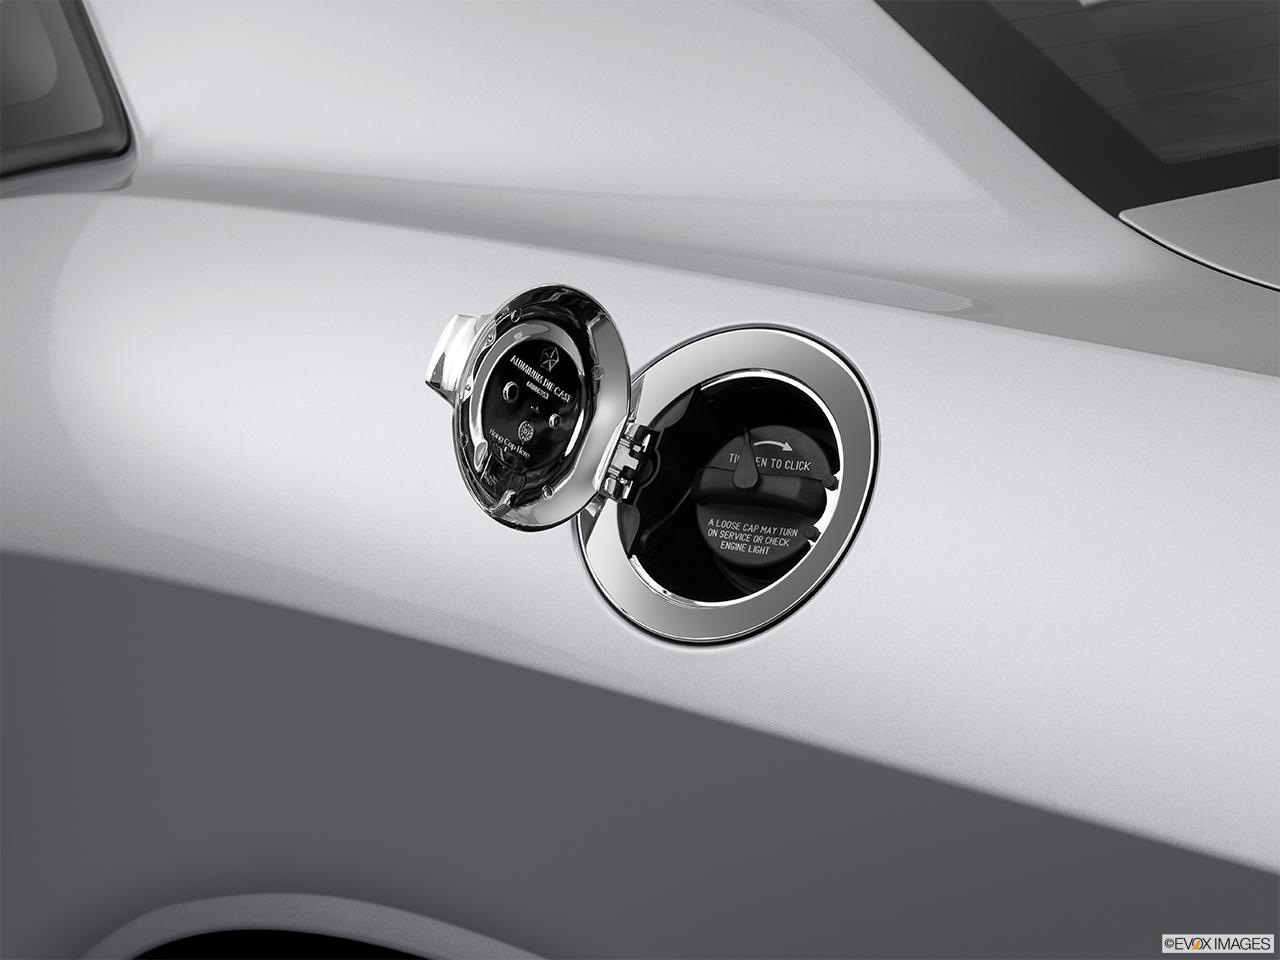 2015 Dodge Challenger Sxt Coupe Front Angle View 2015 Dodge